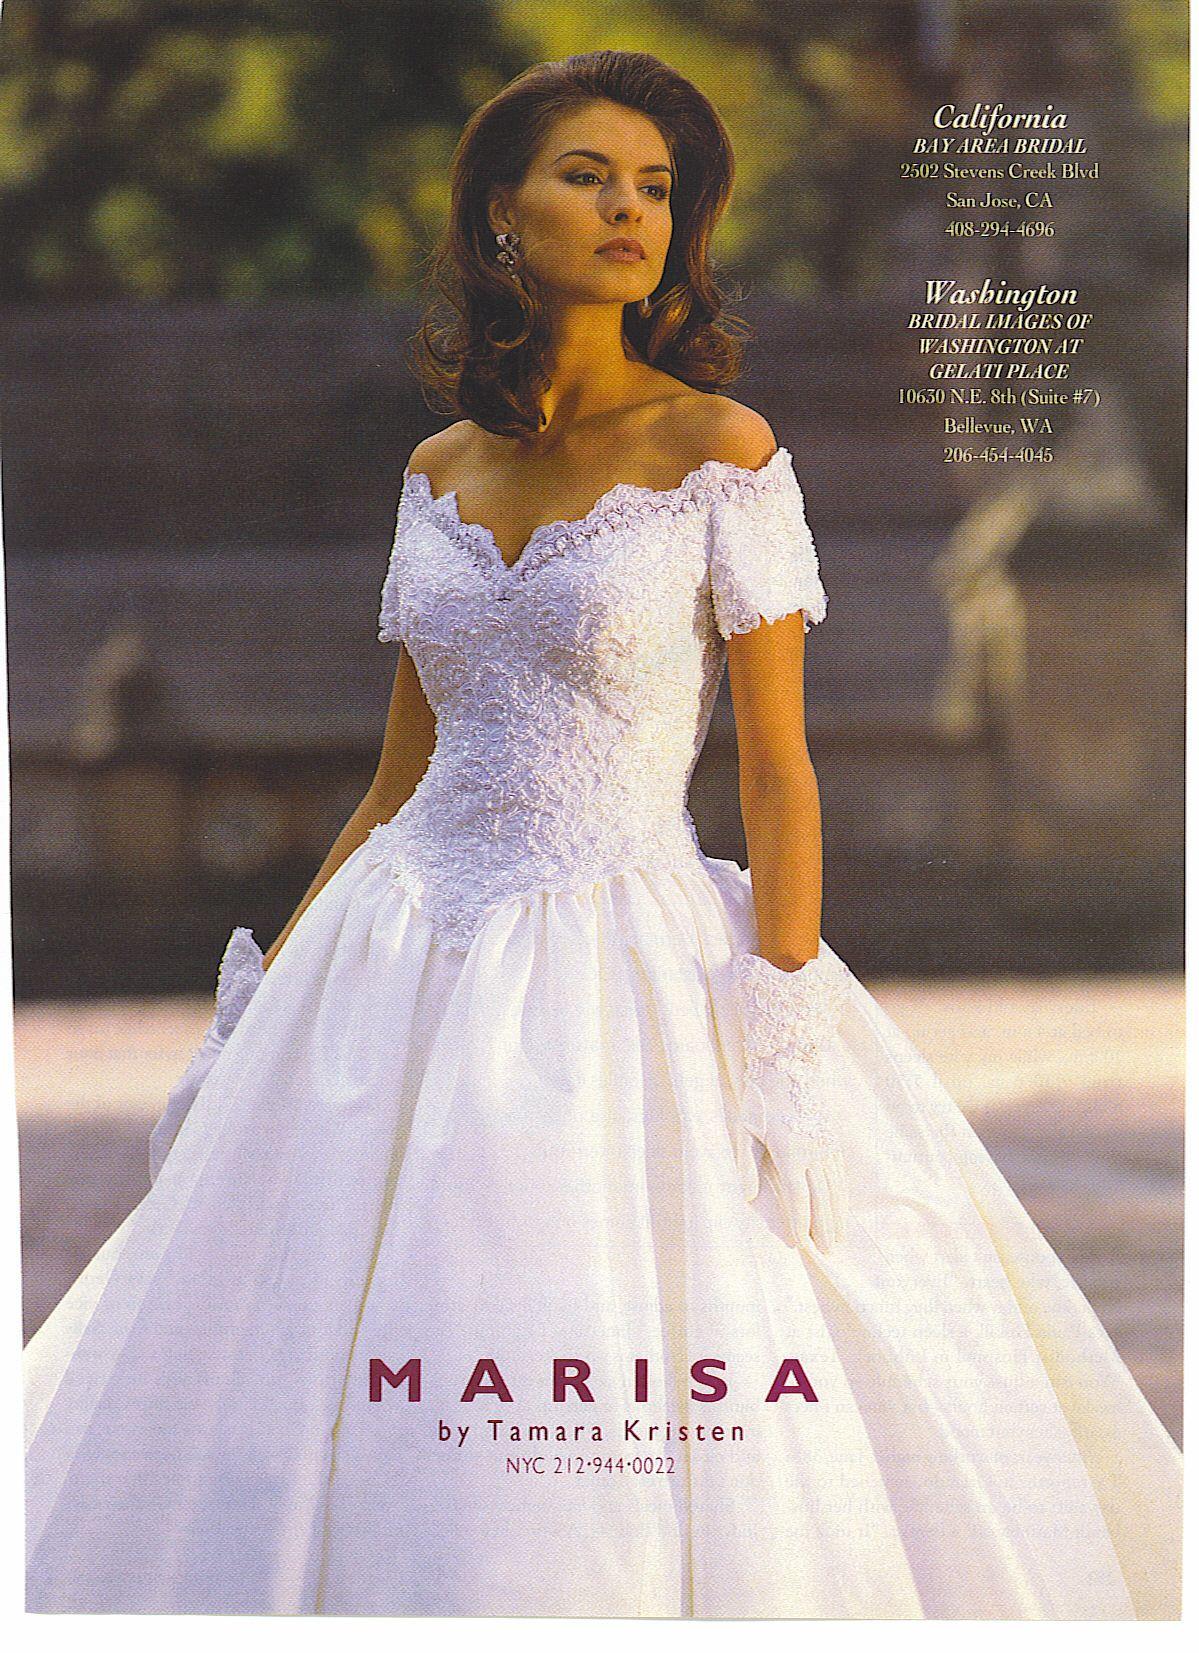 Unique Crazy Wedding Wedding Stuff s Bridal Fashion Wedding Gowns Neckline Brides By The